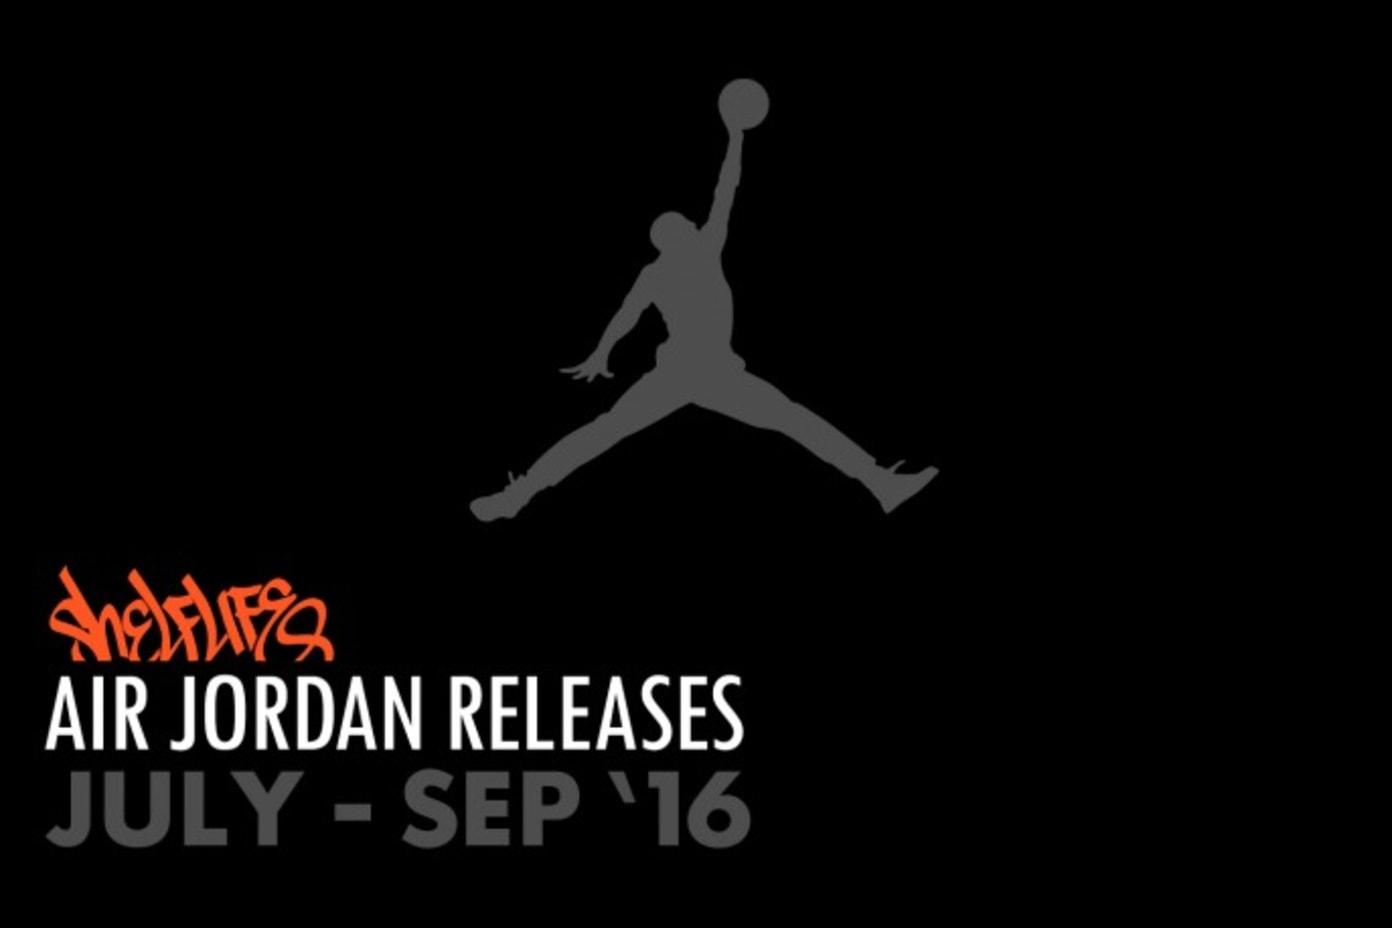 Shelflife Air Jordan Release Dates 2016 July – September